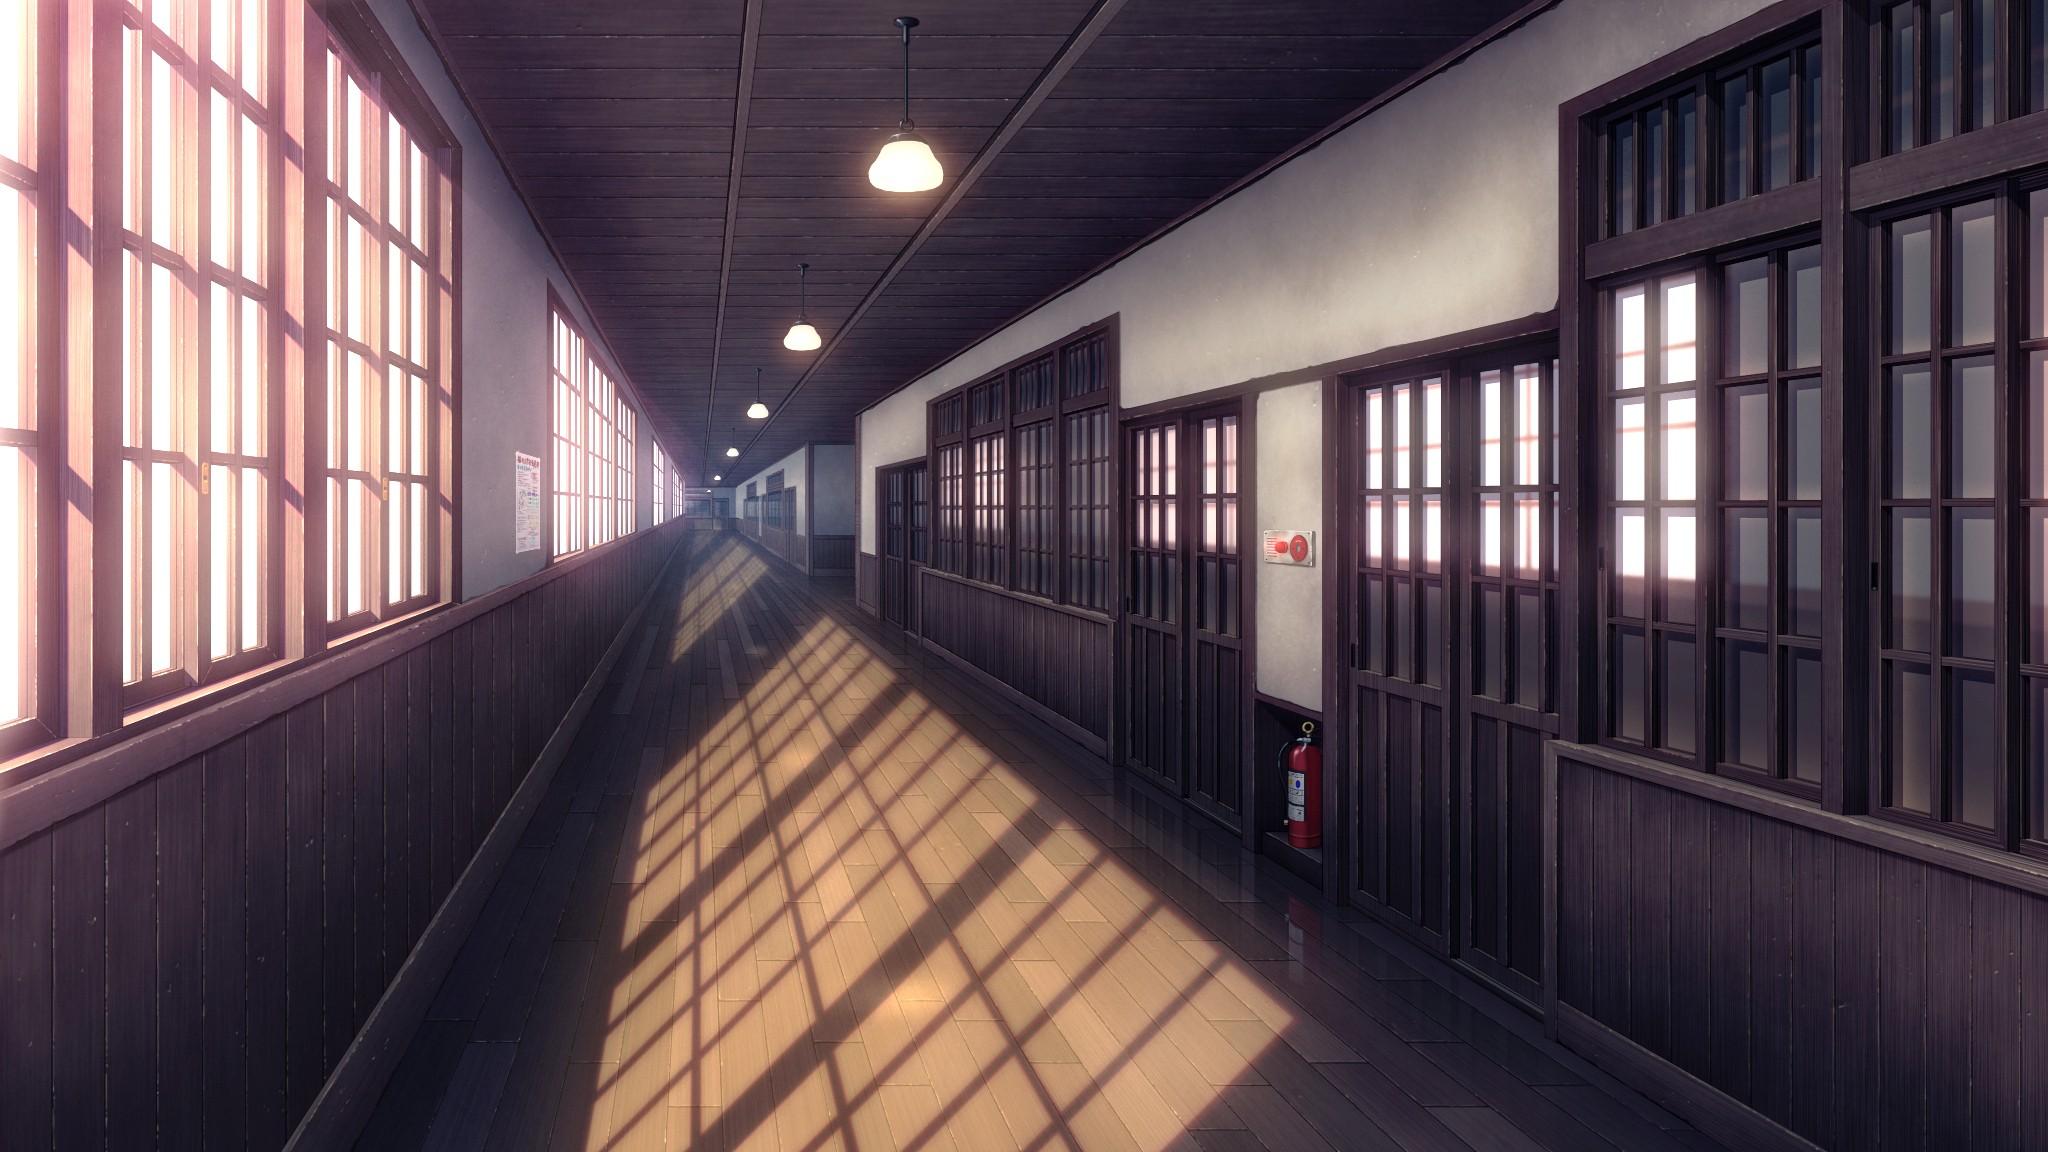 Window Architecture Anime Building Hallway Symmetry School Library Door Interior Design Transport Hall Public